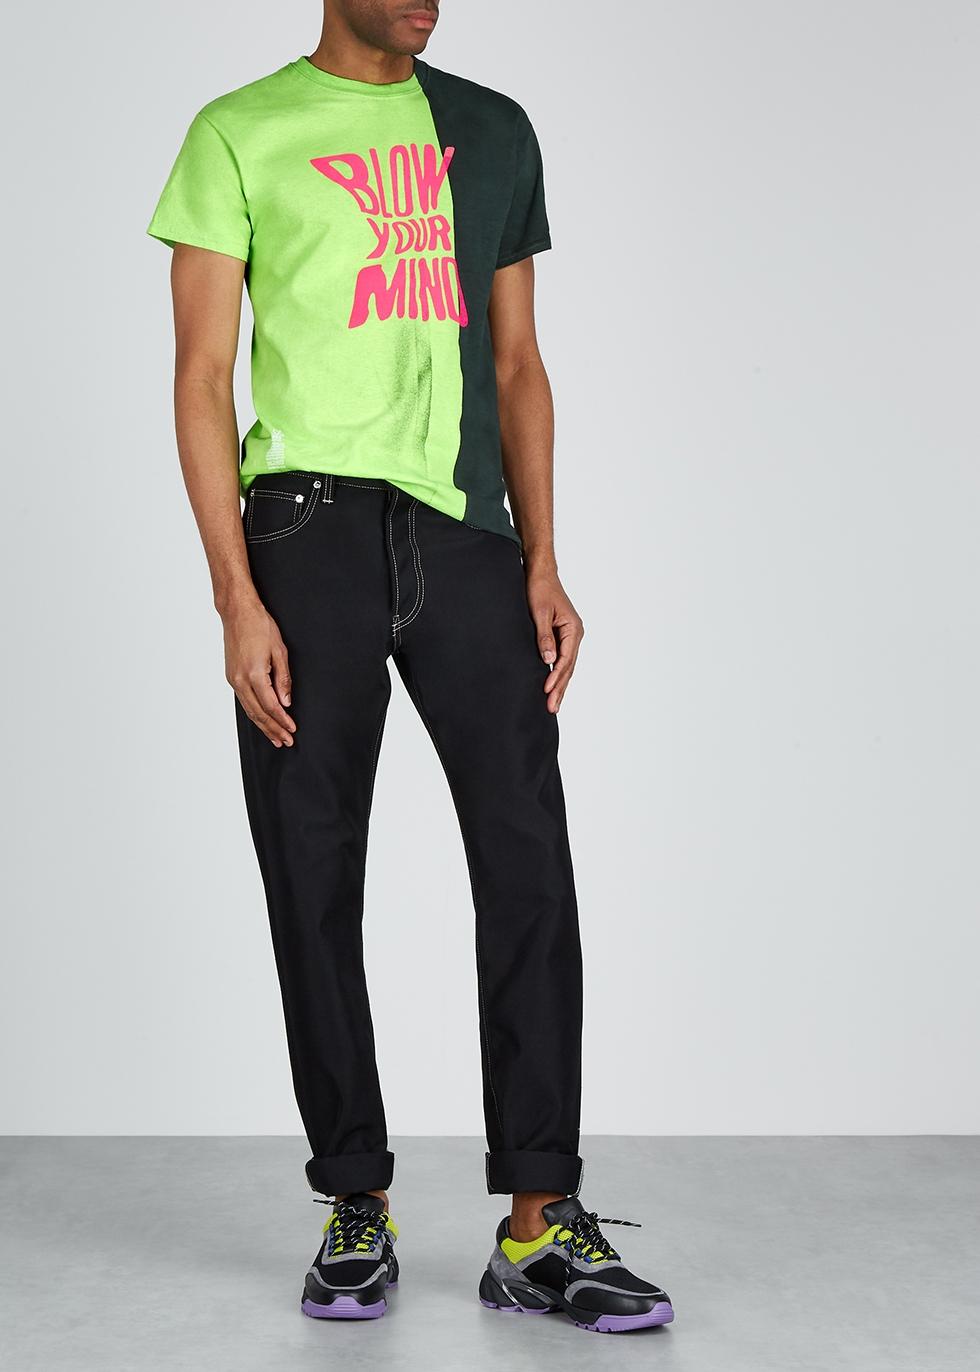 Green printed cotton T-shirt - Darkoveli